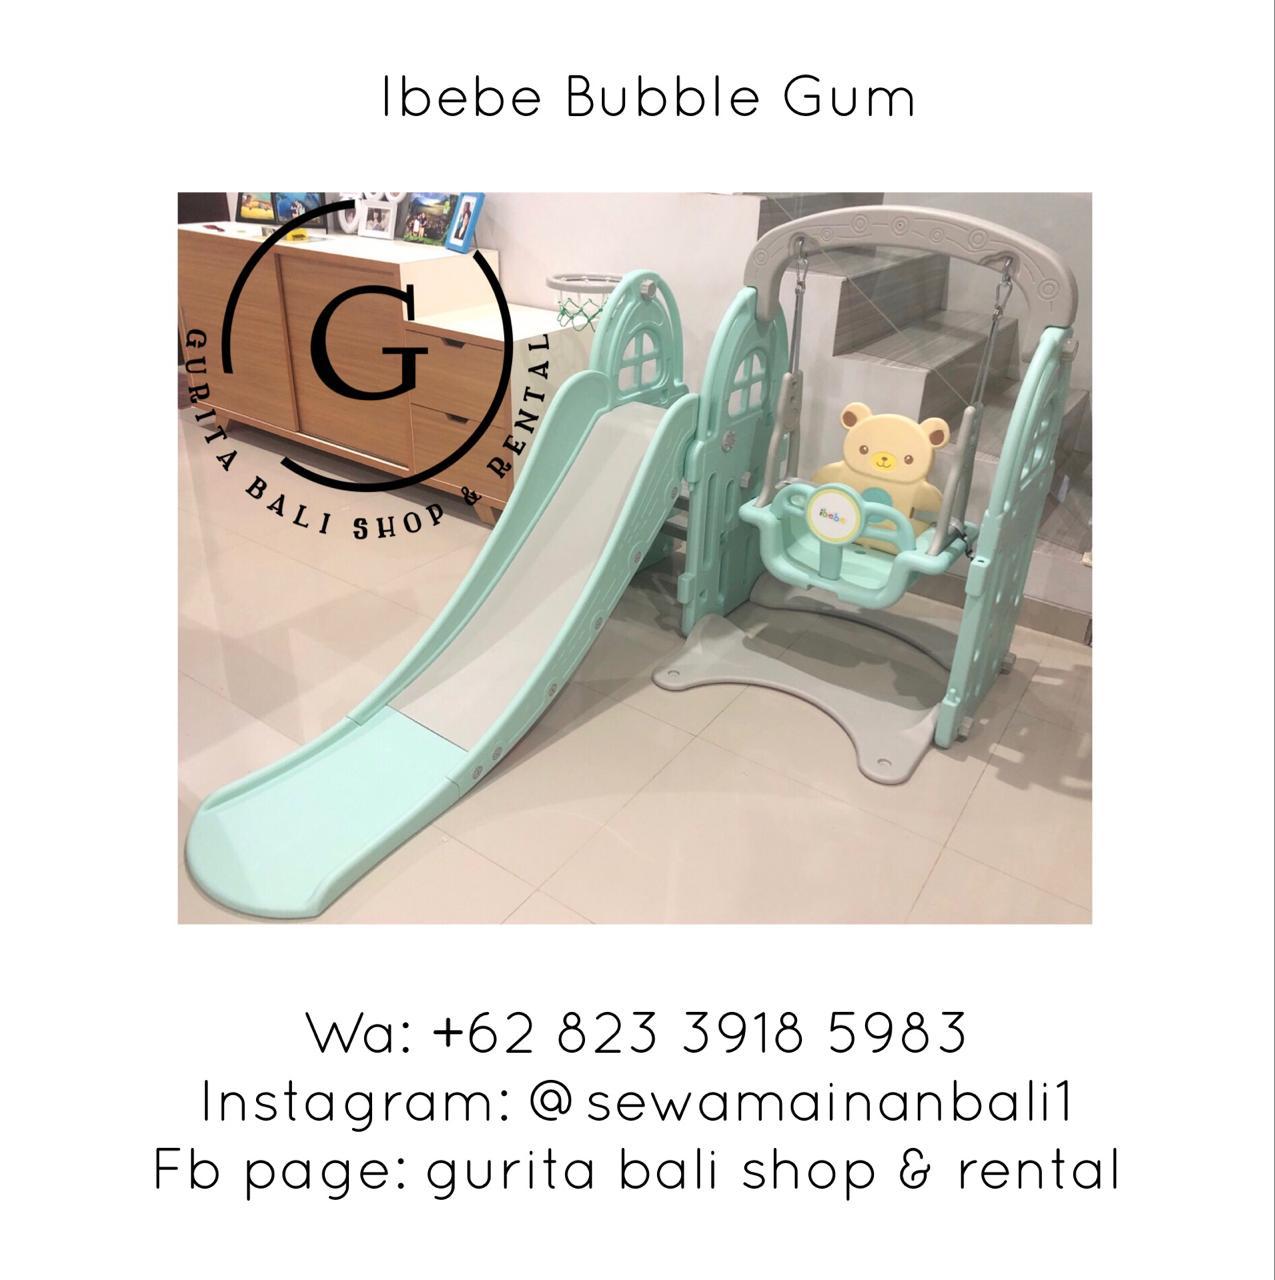 IBEBE BUBBLE GUM